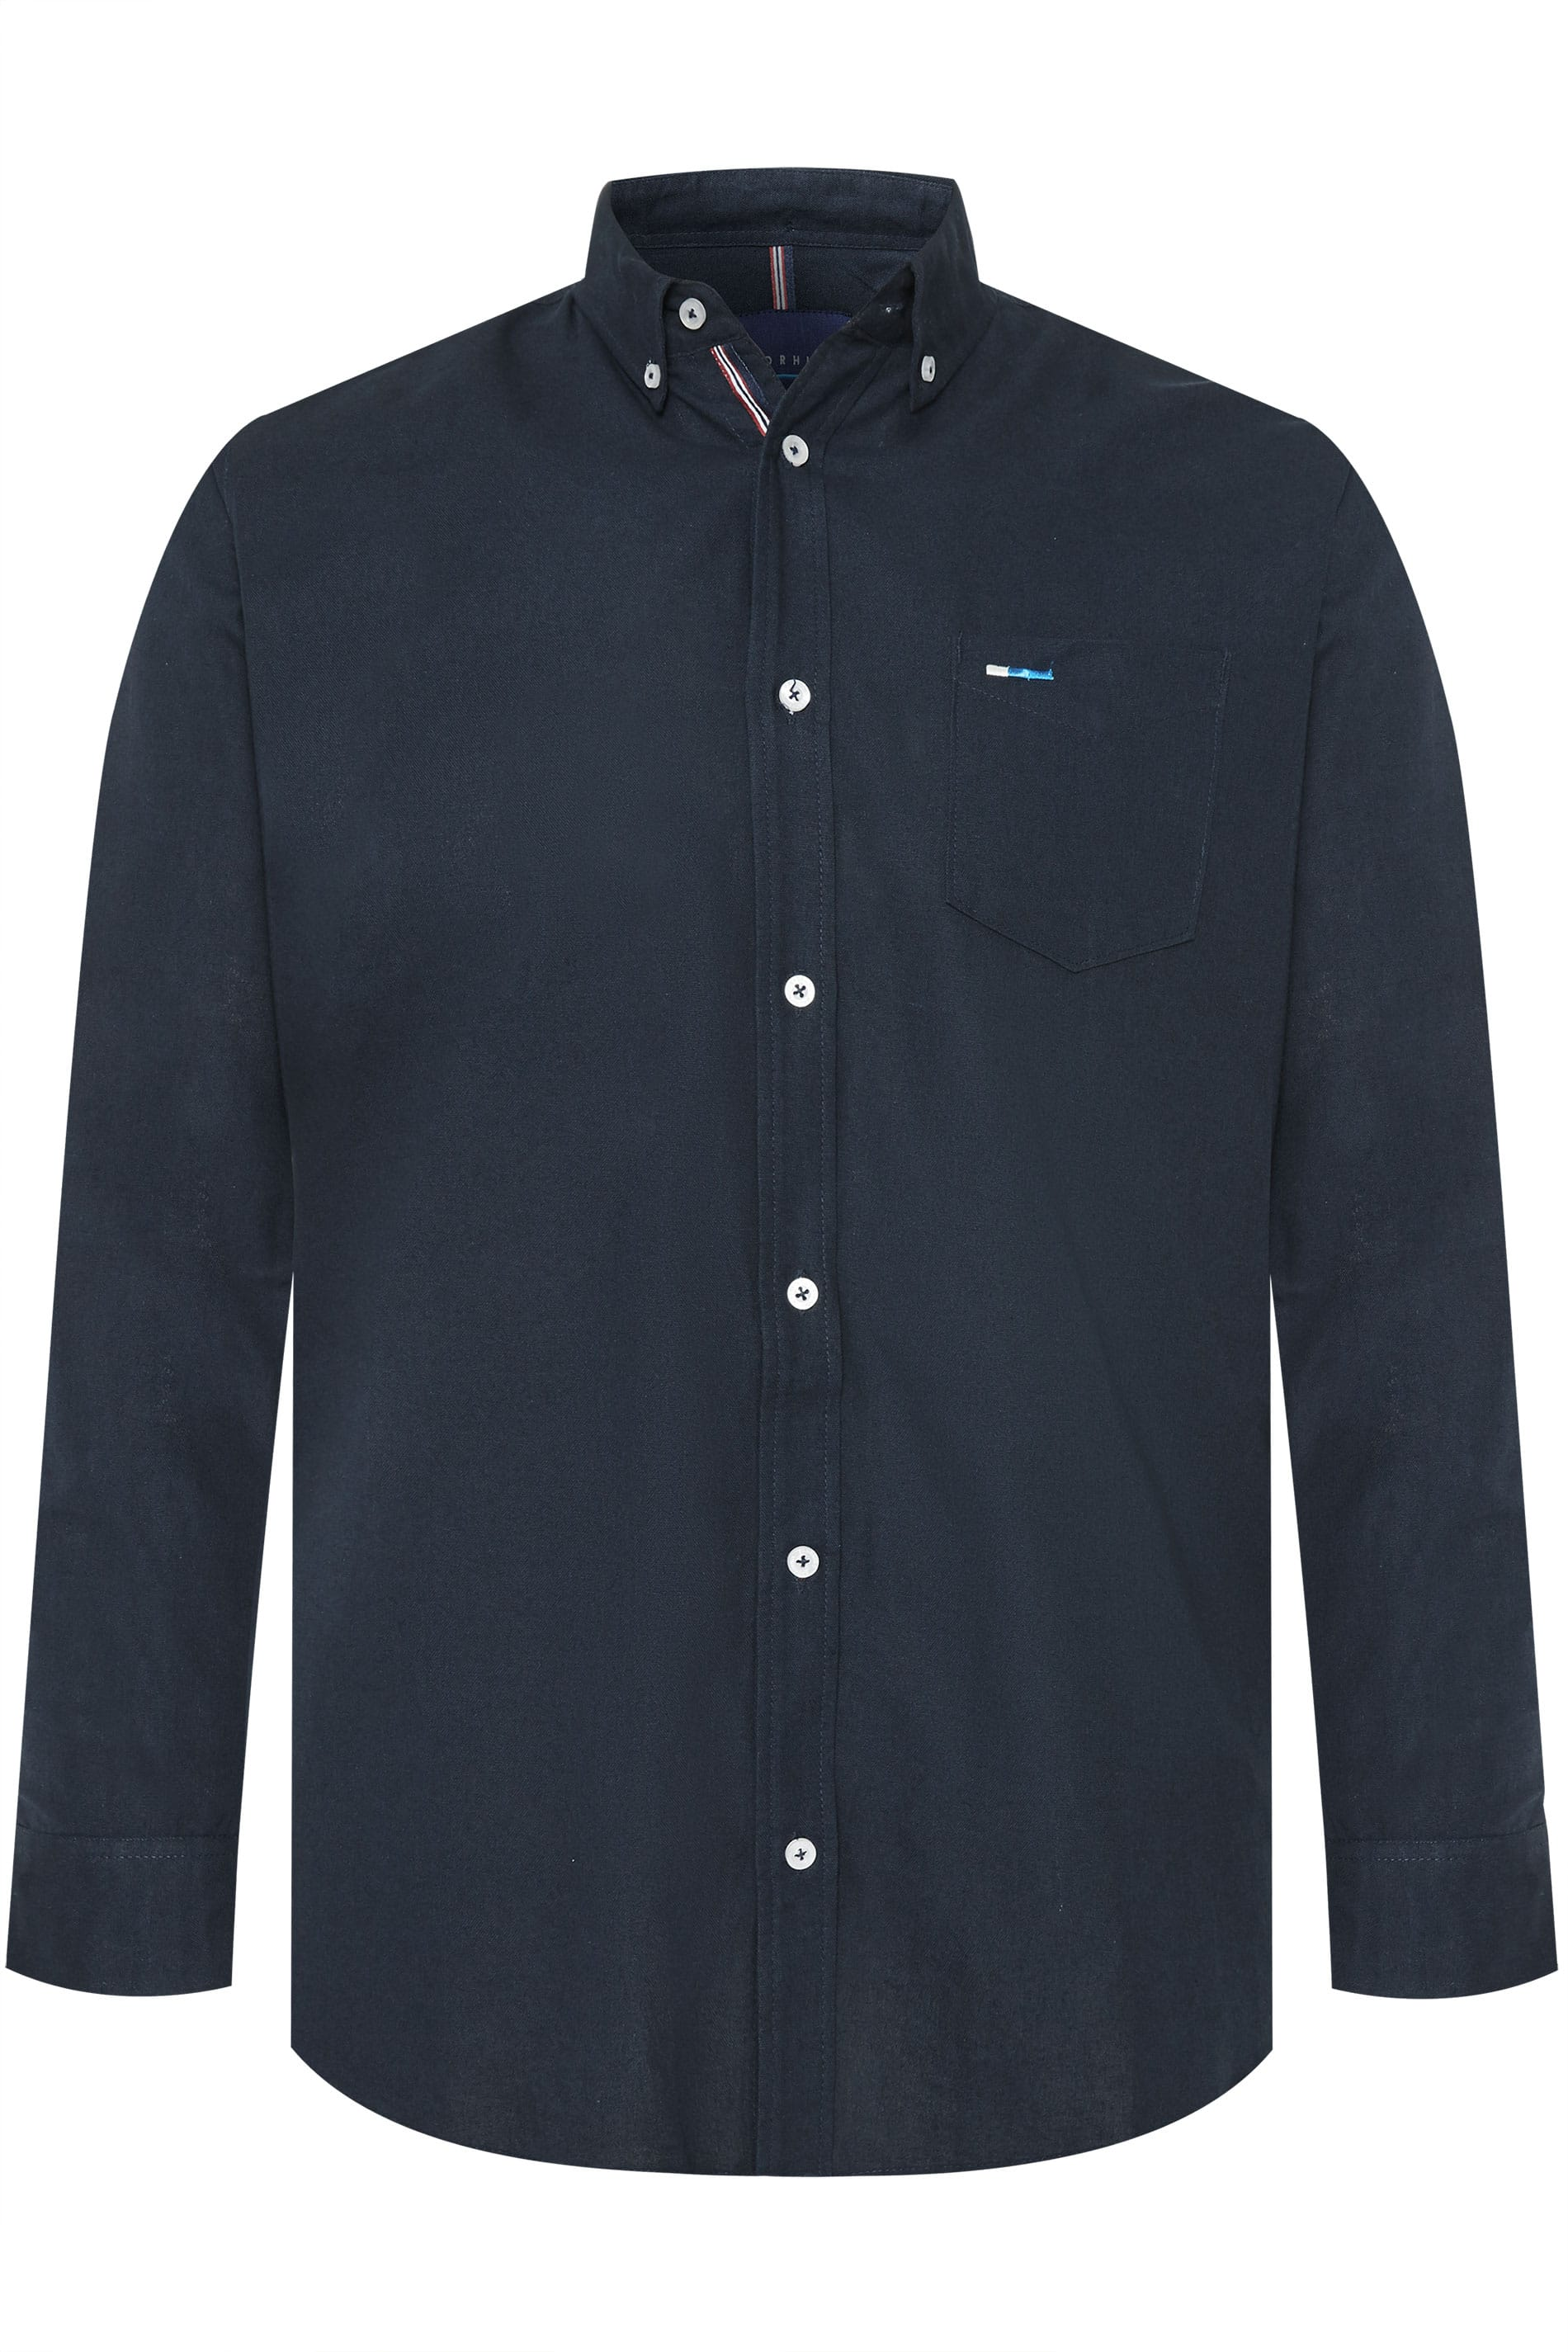 BadRhino Navy Cotton Long Sleeved Oxford Shirt